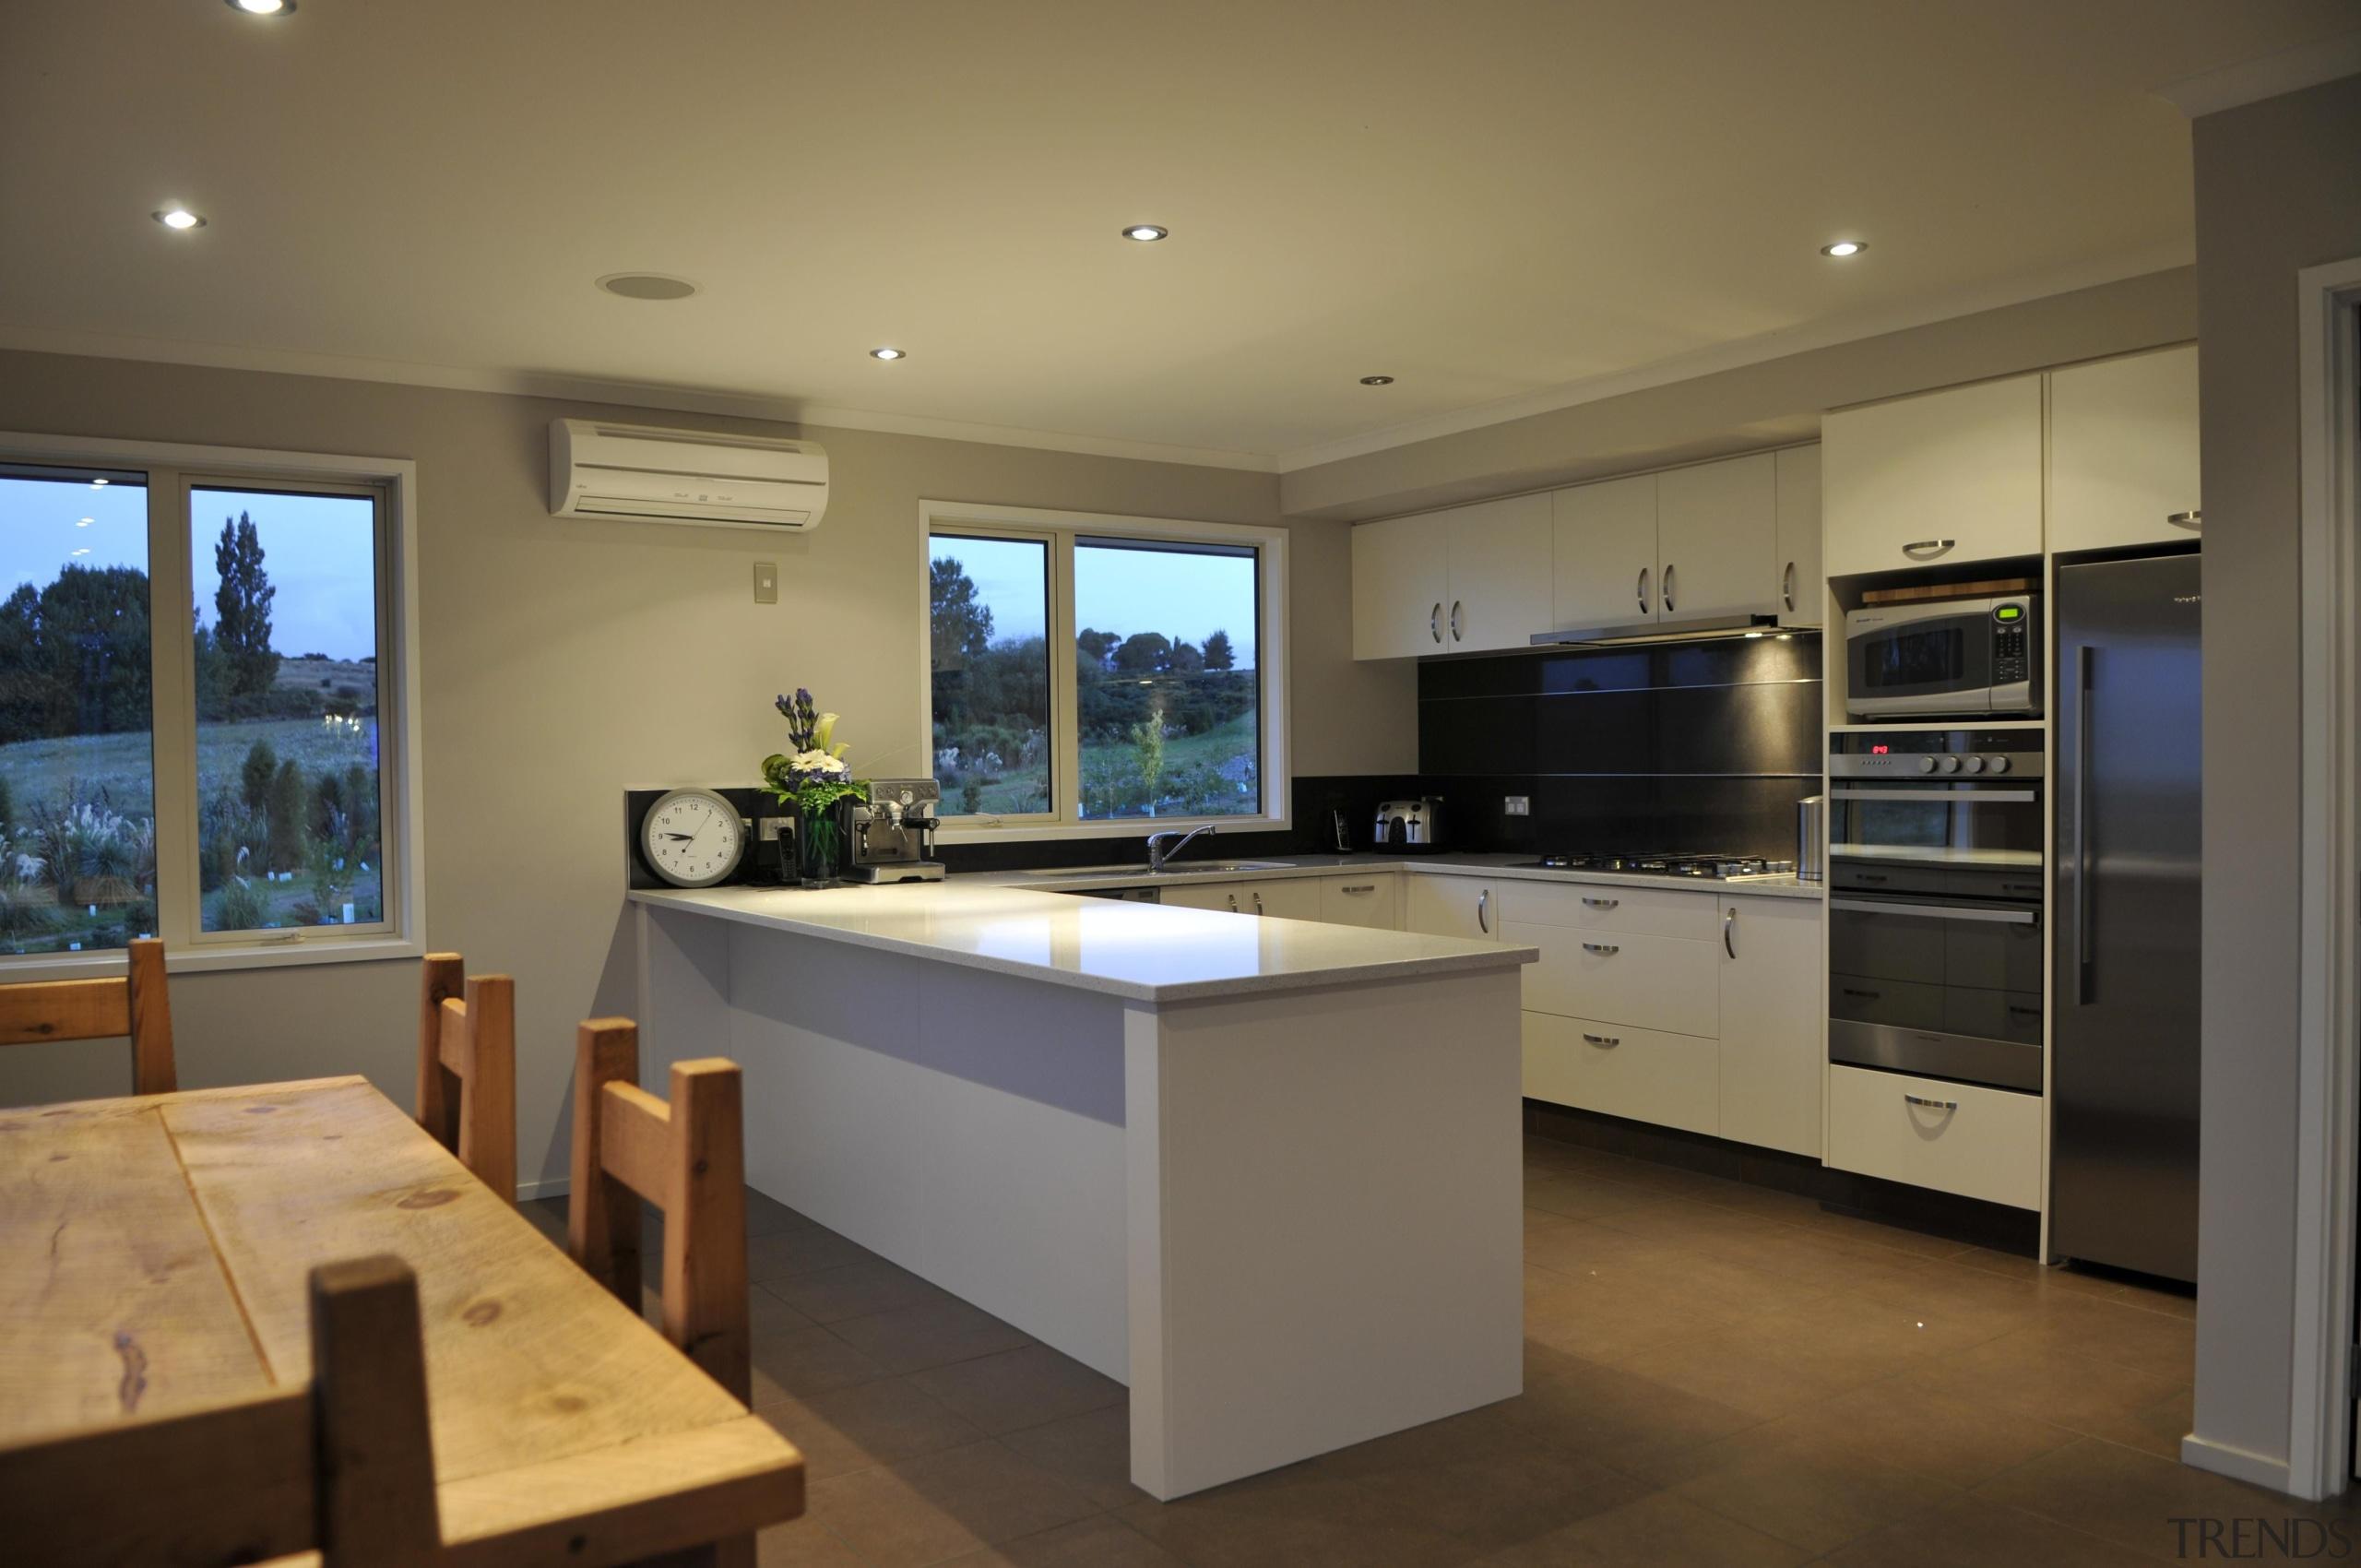 For more information, please visit www.gjgardner.co.nz countertop, interior design, kitchen, real estate, room, brown